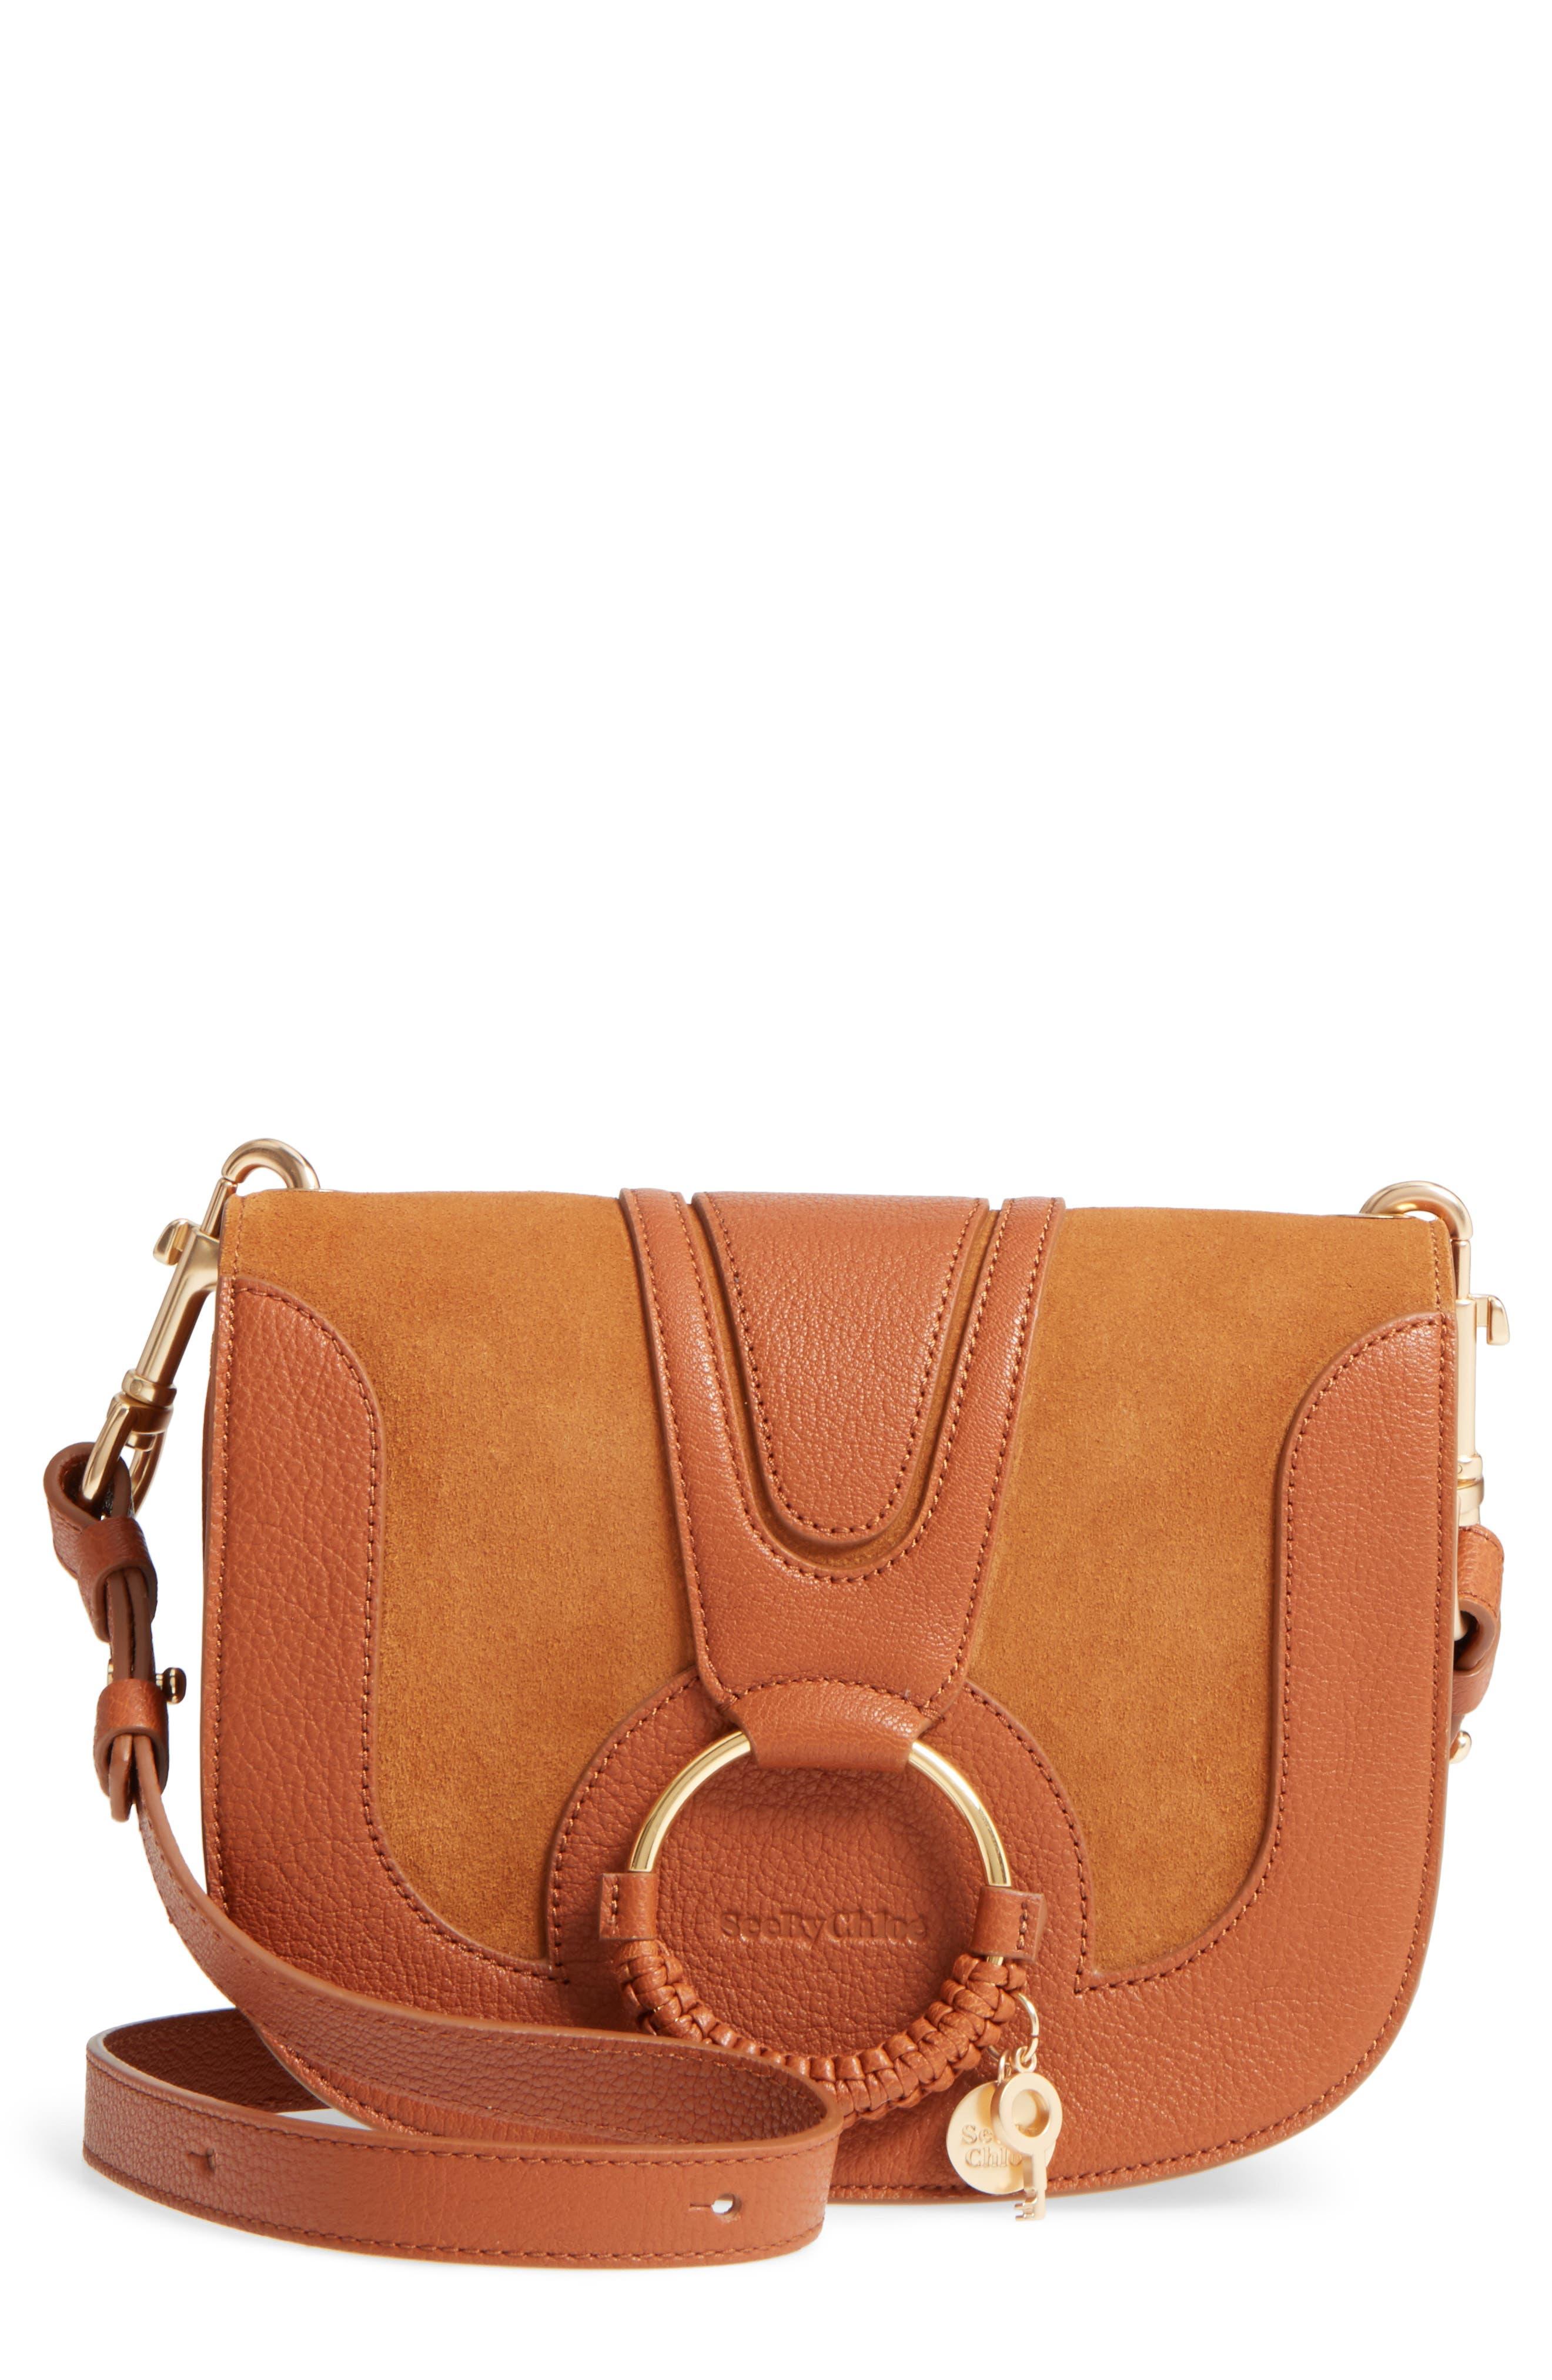 Hana Small Leather Crossbody Bag,                         Main,                         color,